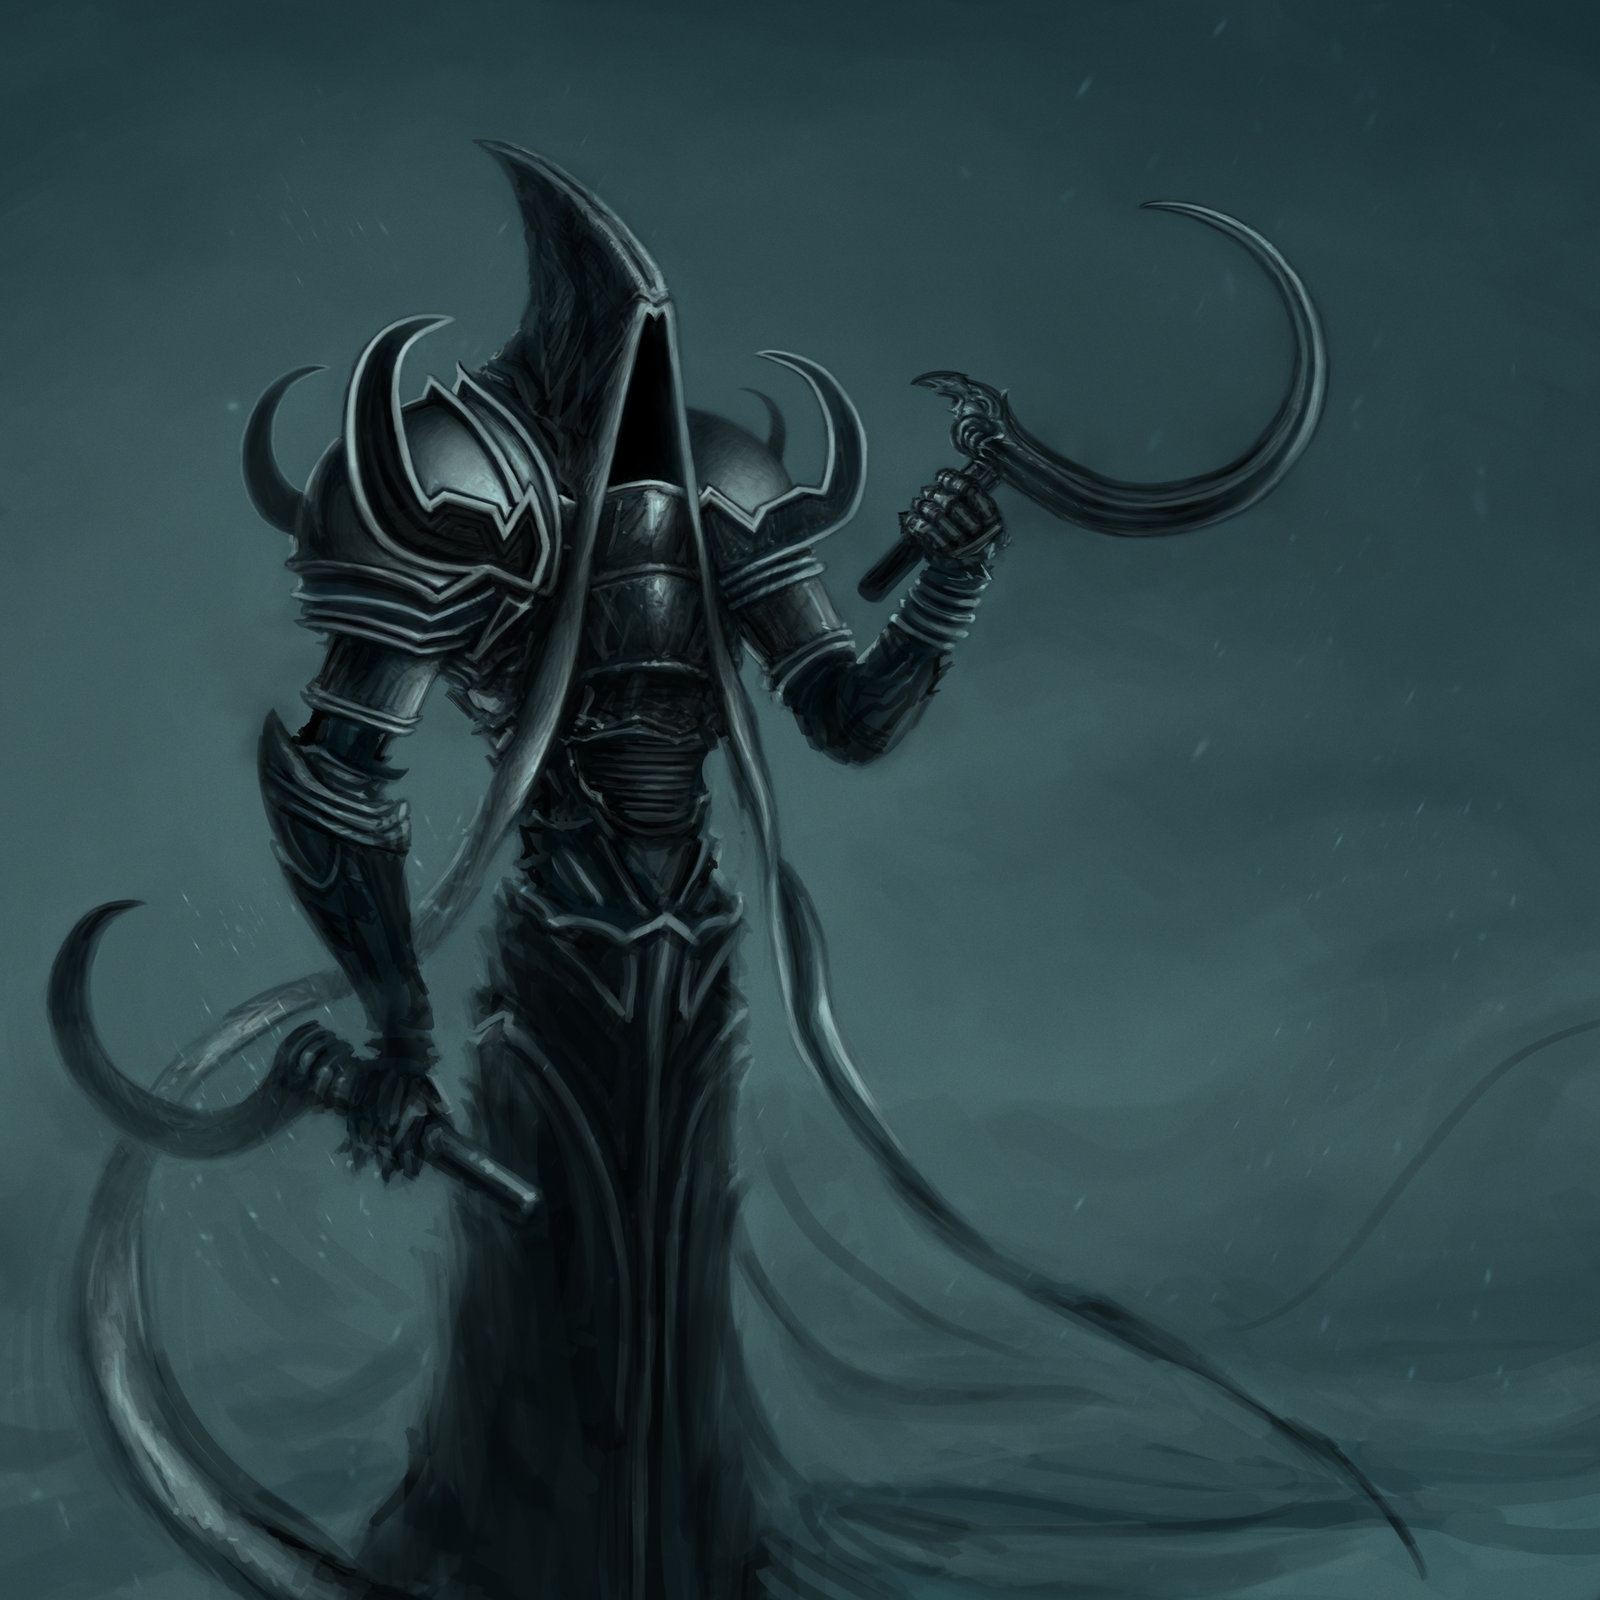 Diablo 3 Malthael Wallpaper